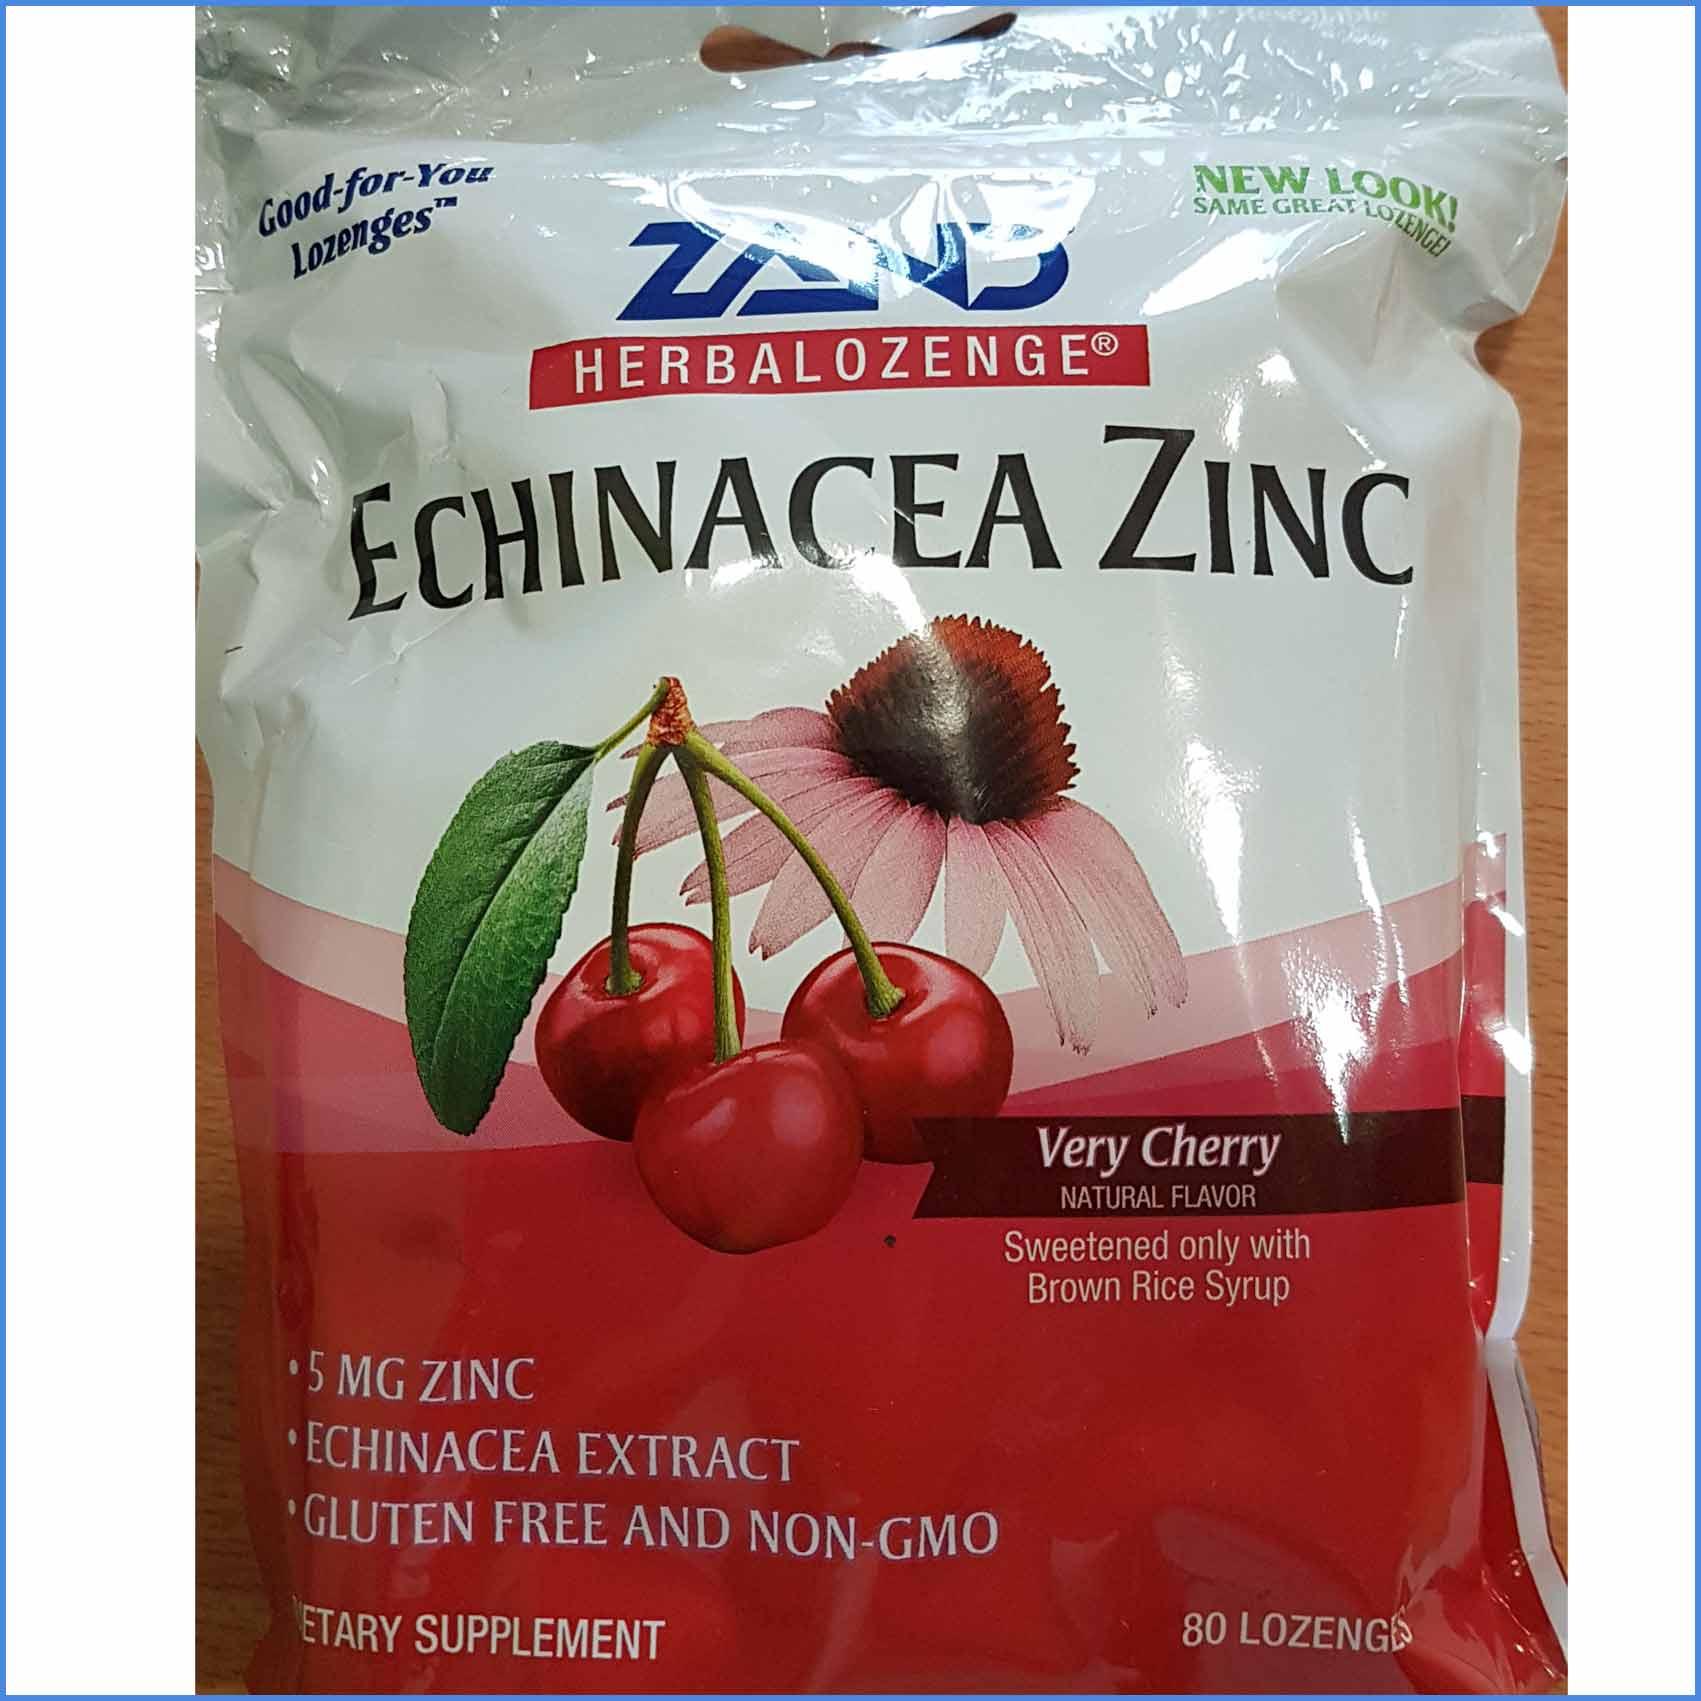 Echinacea zinc 80 lozengers